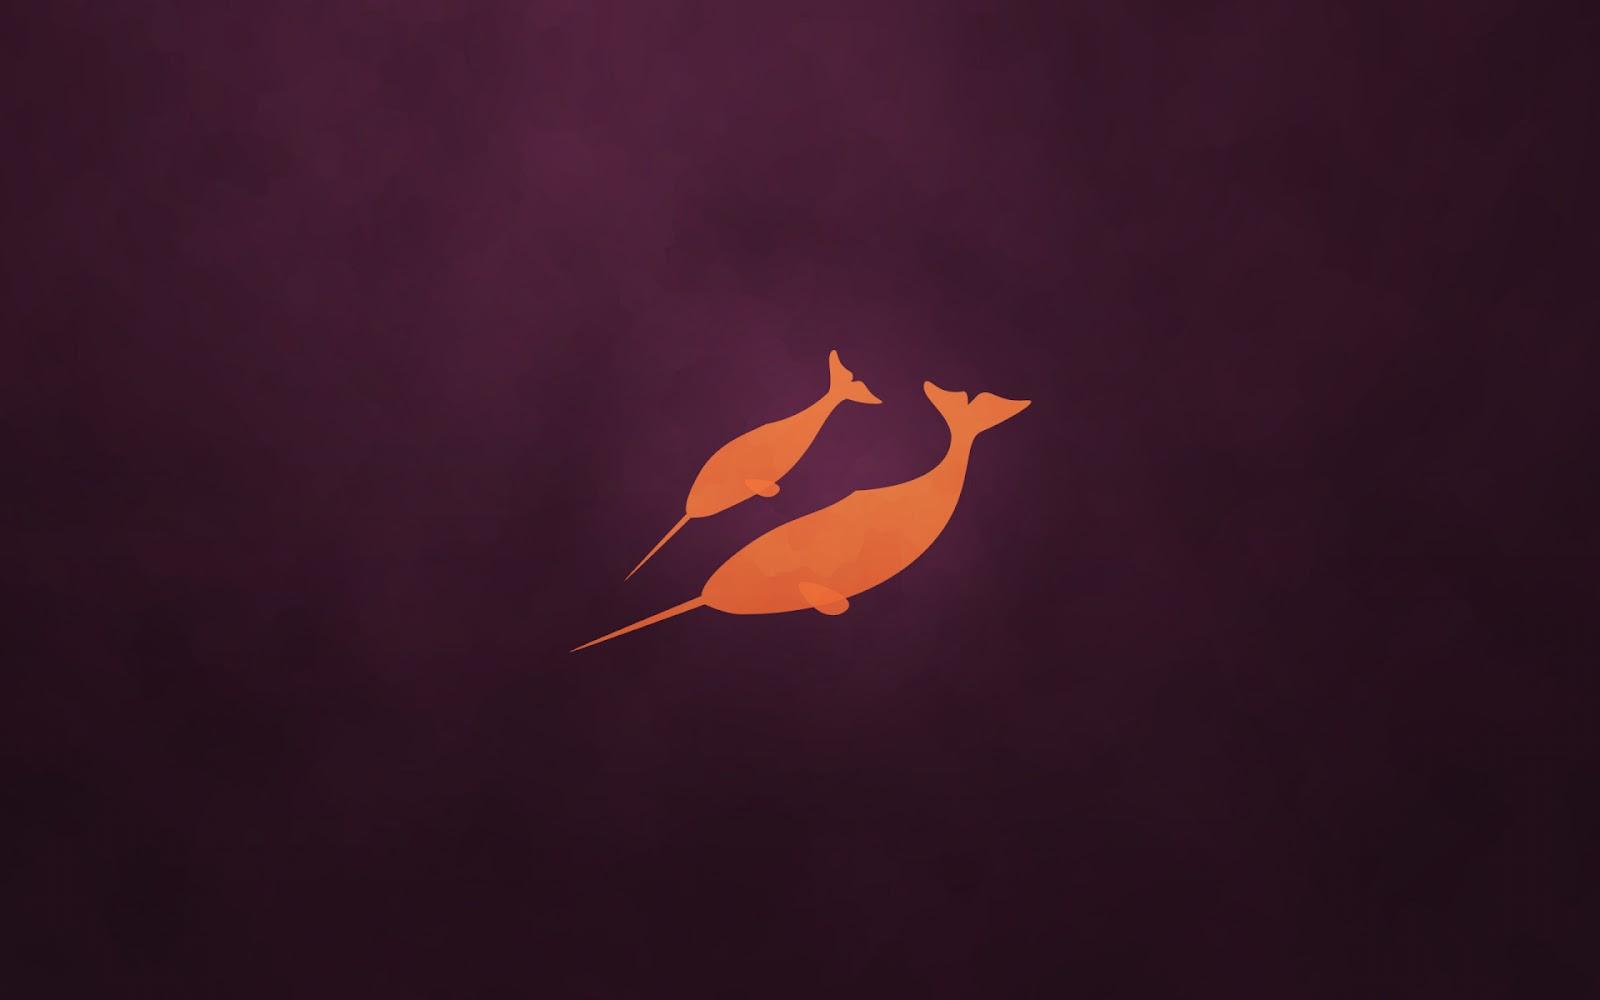 http://4.bp.blogspot.com/-mGPwEc7Kp_k/T0eXa99C-MI/AAAAAAAADzg/Ov9YiI4kjA0/s1600/Ubuntu%2B11.04%2BHD%2BWallpaper.jpg